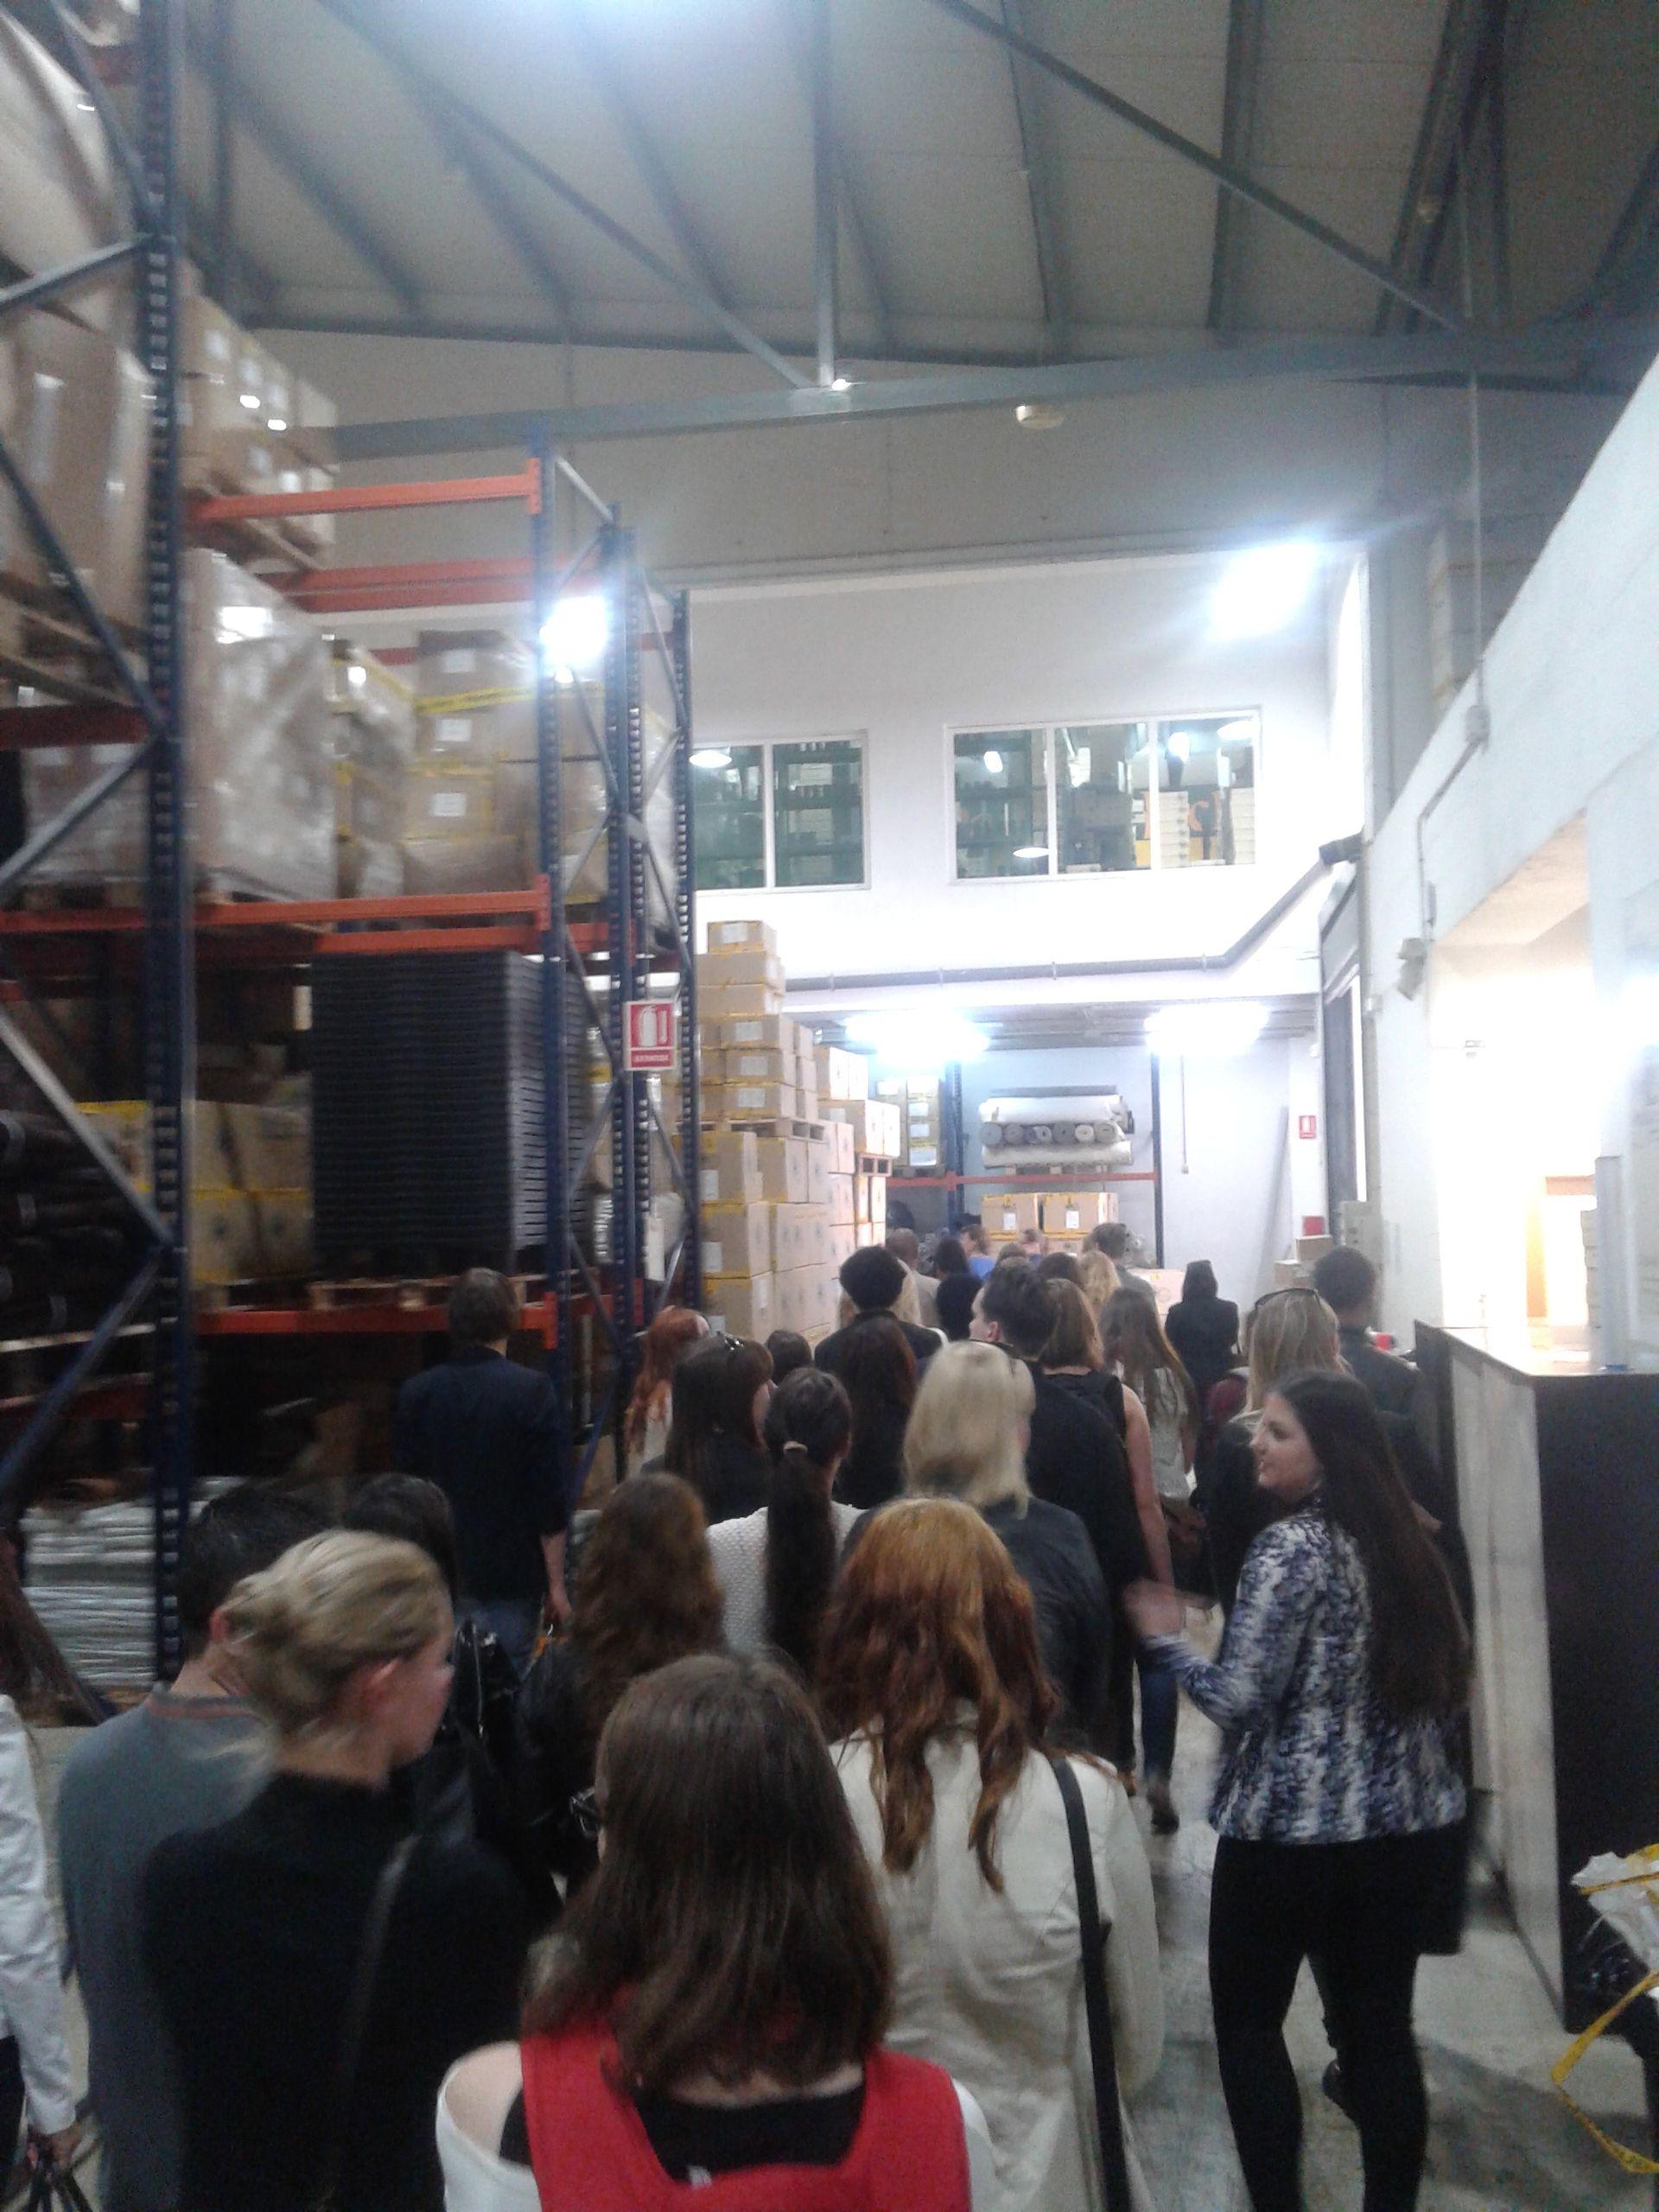 @Panama Jack #PanamaJackBoots Recorrido por las instalaciones de #PanamaJackBoots #HZEELAND #Holandeses #Alicante #UA #2014 #CSI #ALCexperience #ExperienceUA #SpanishCoursesUA #ErasmusUA2014